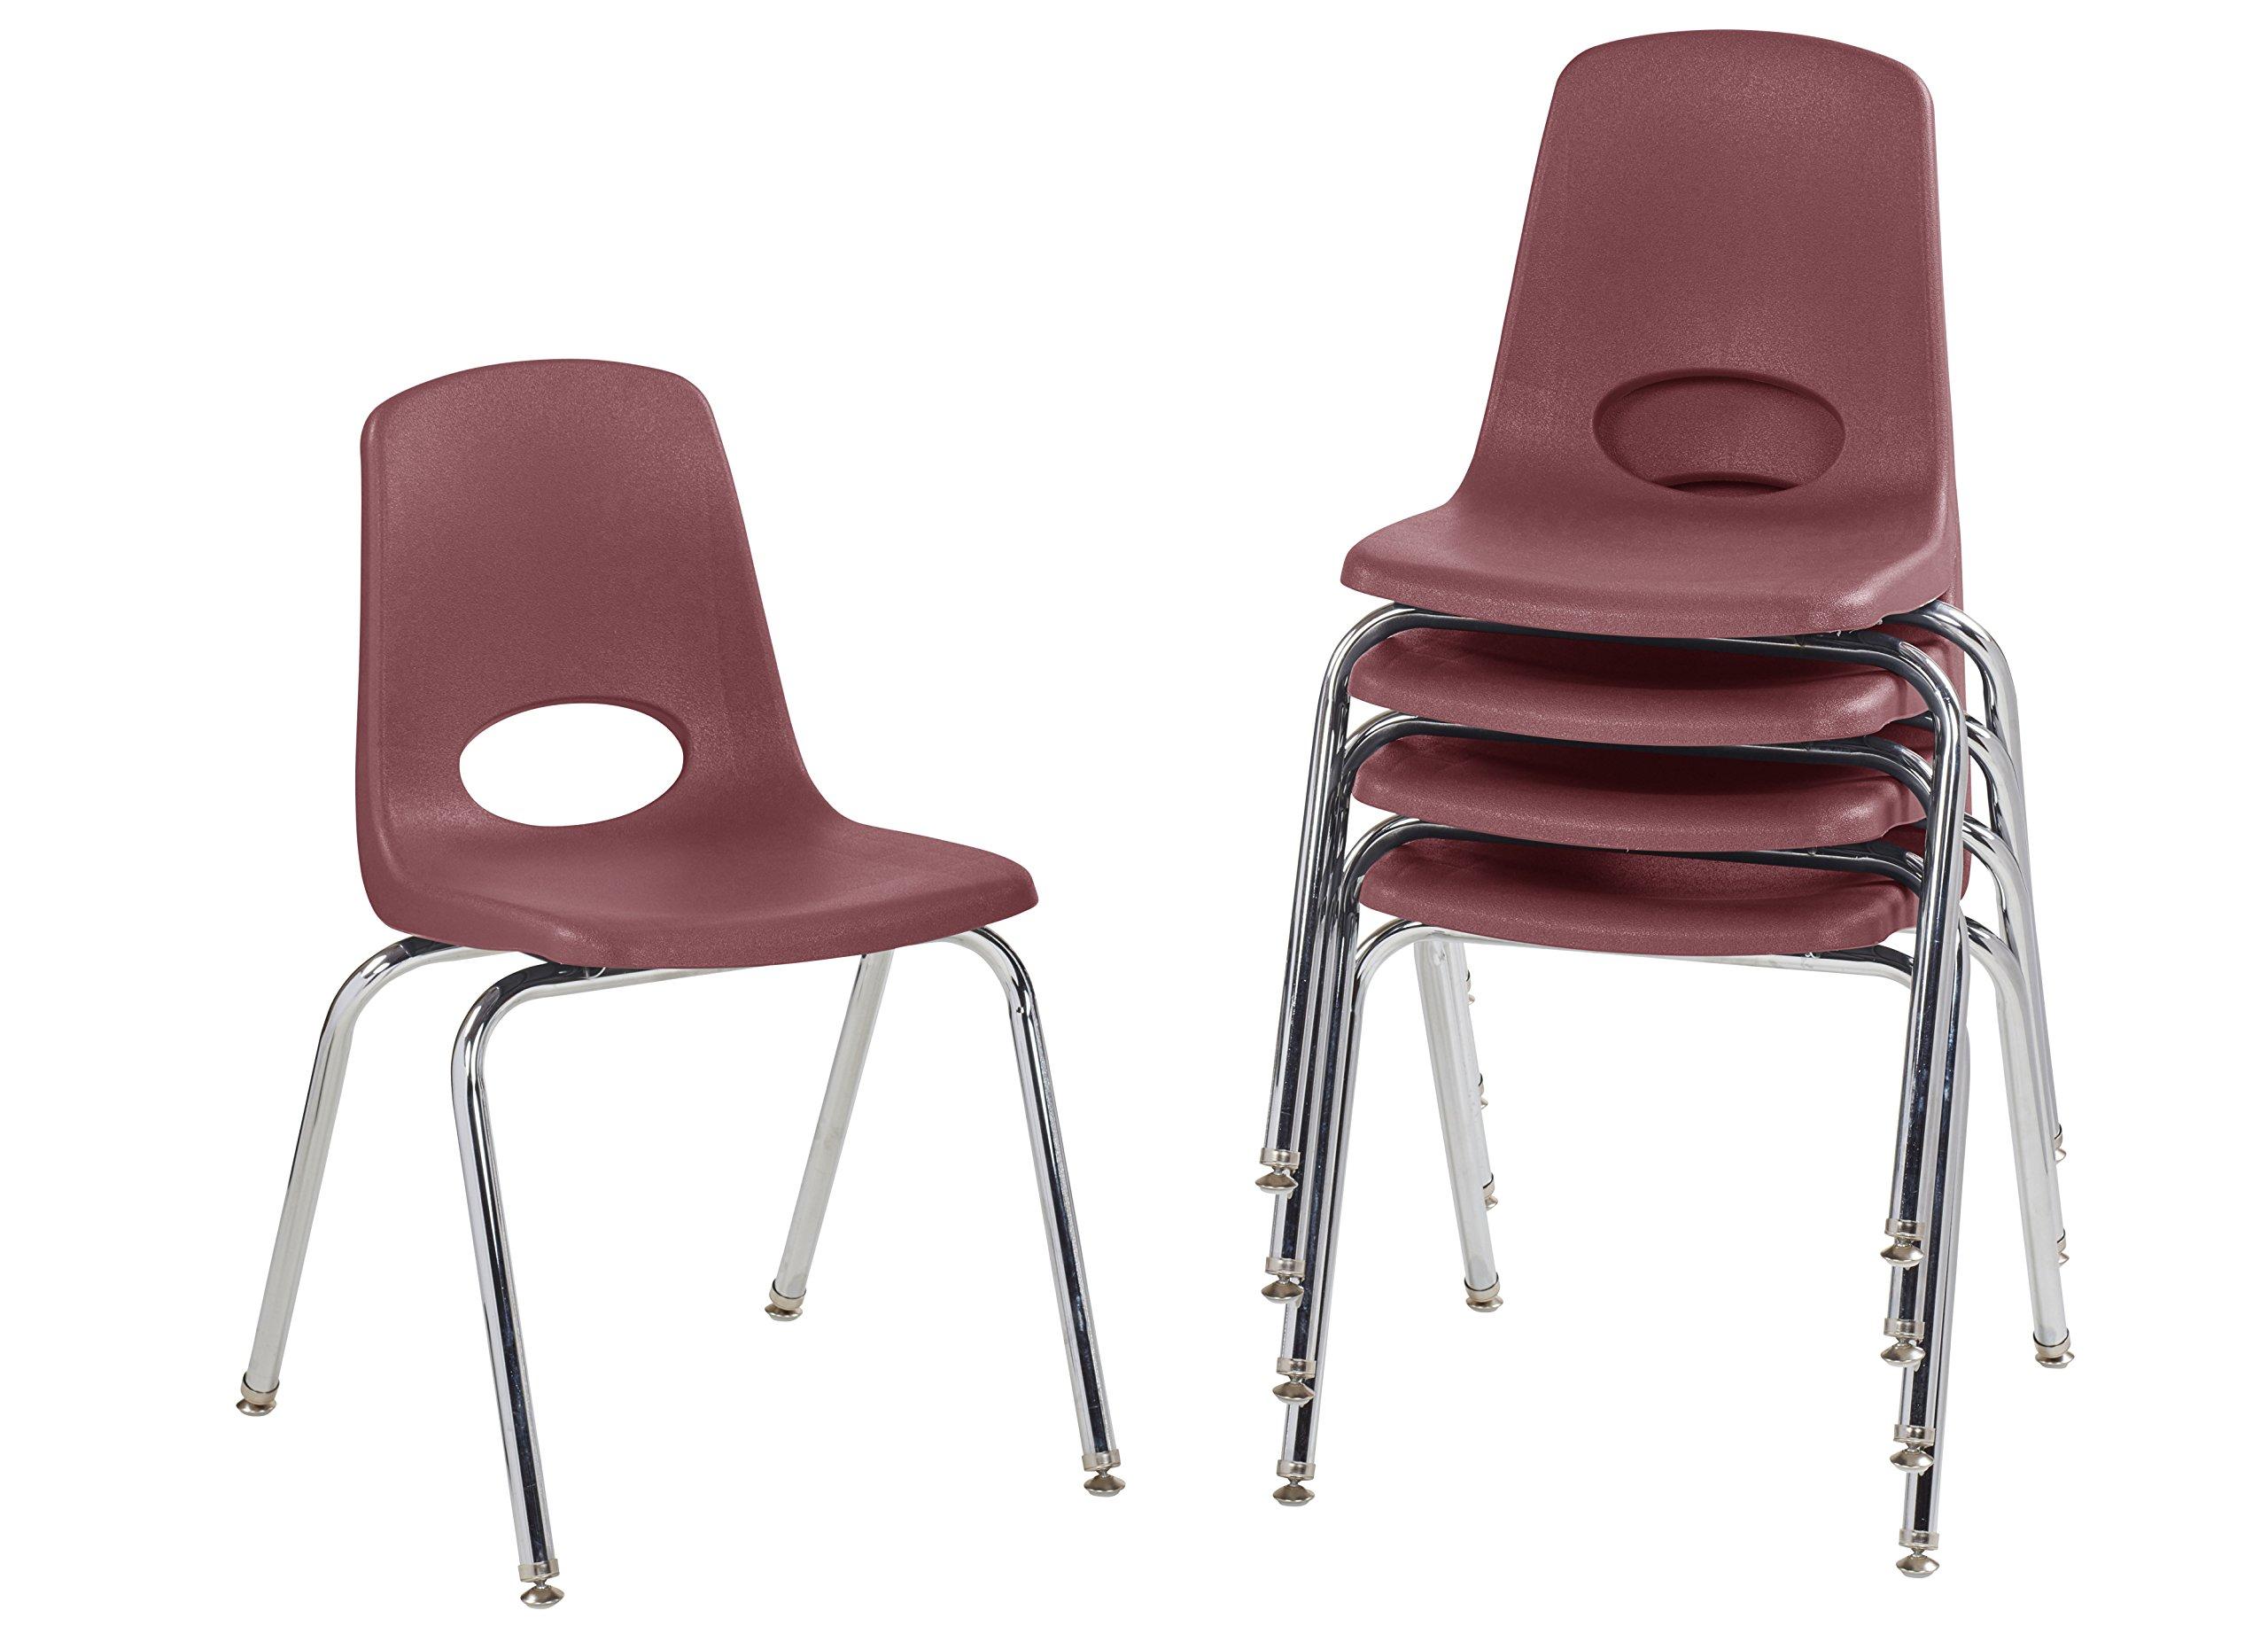 ECR4Kids 18'' School Stack Chair, Chrome Legs with Nylon Swivel Glides, Burgundy (5-Pack) by ECR4Kids